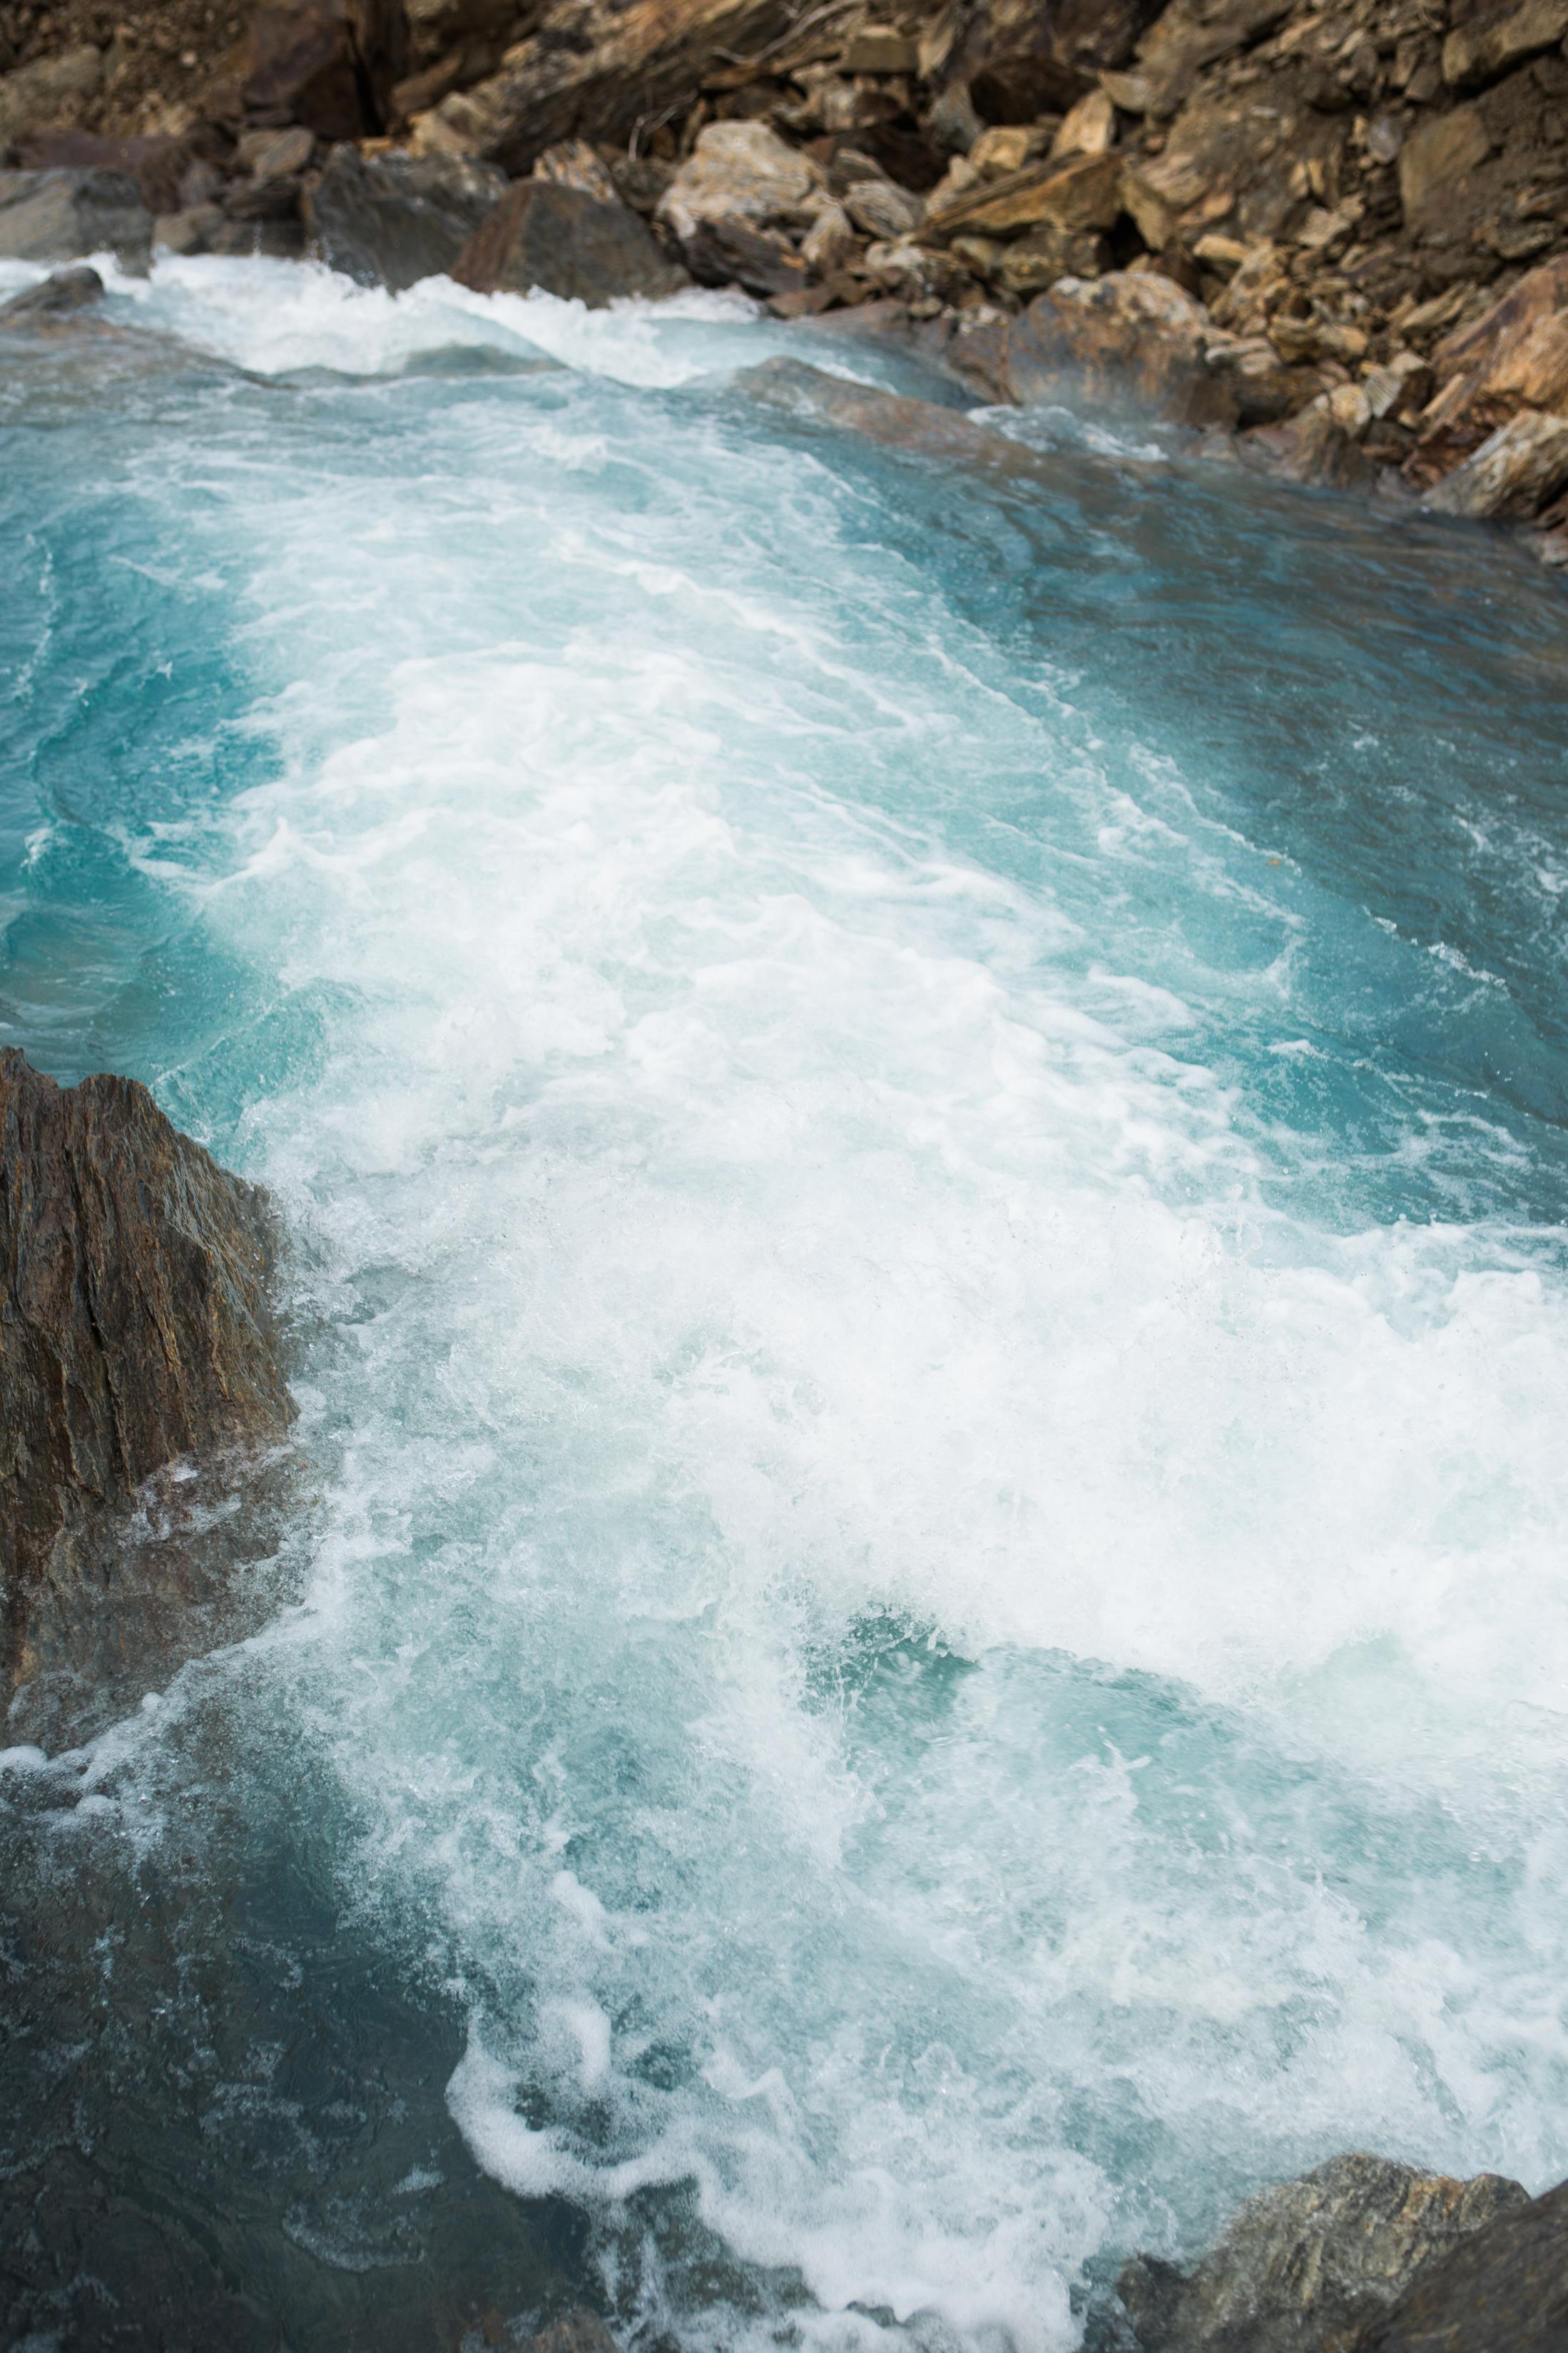 CindyGiovagnoli_Alaska_KoyukukRiver_SukakpakMountain_JimRiver_ArcticCircle_fly_fishing_September-056.jpg